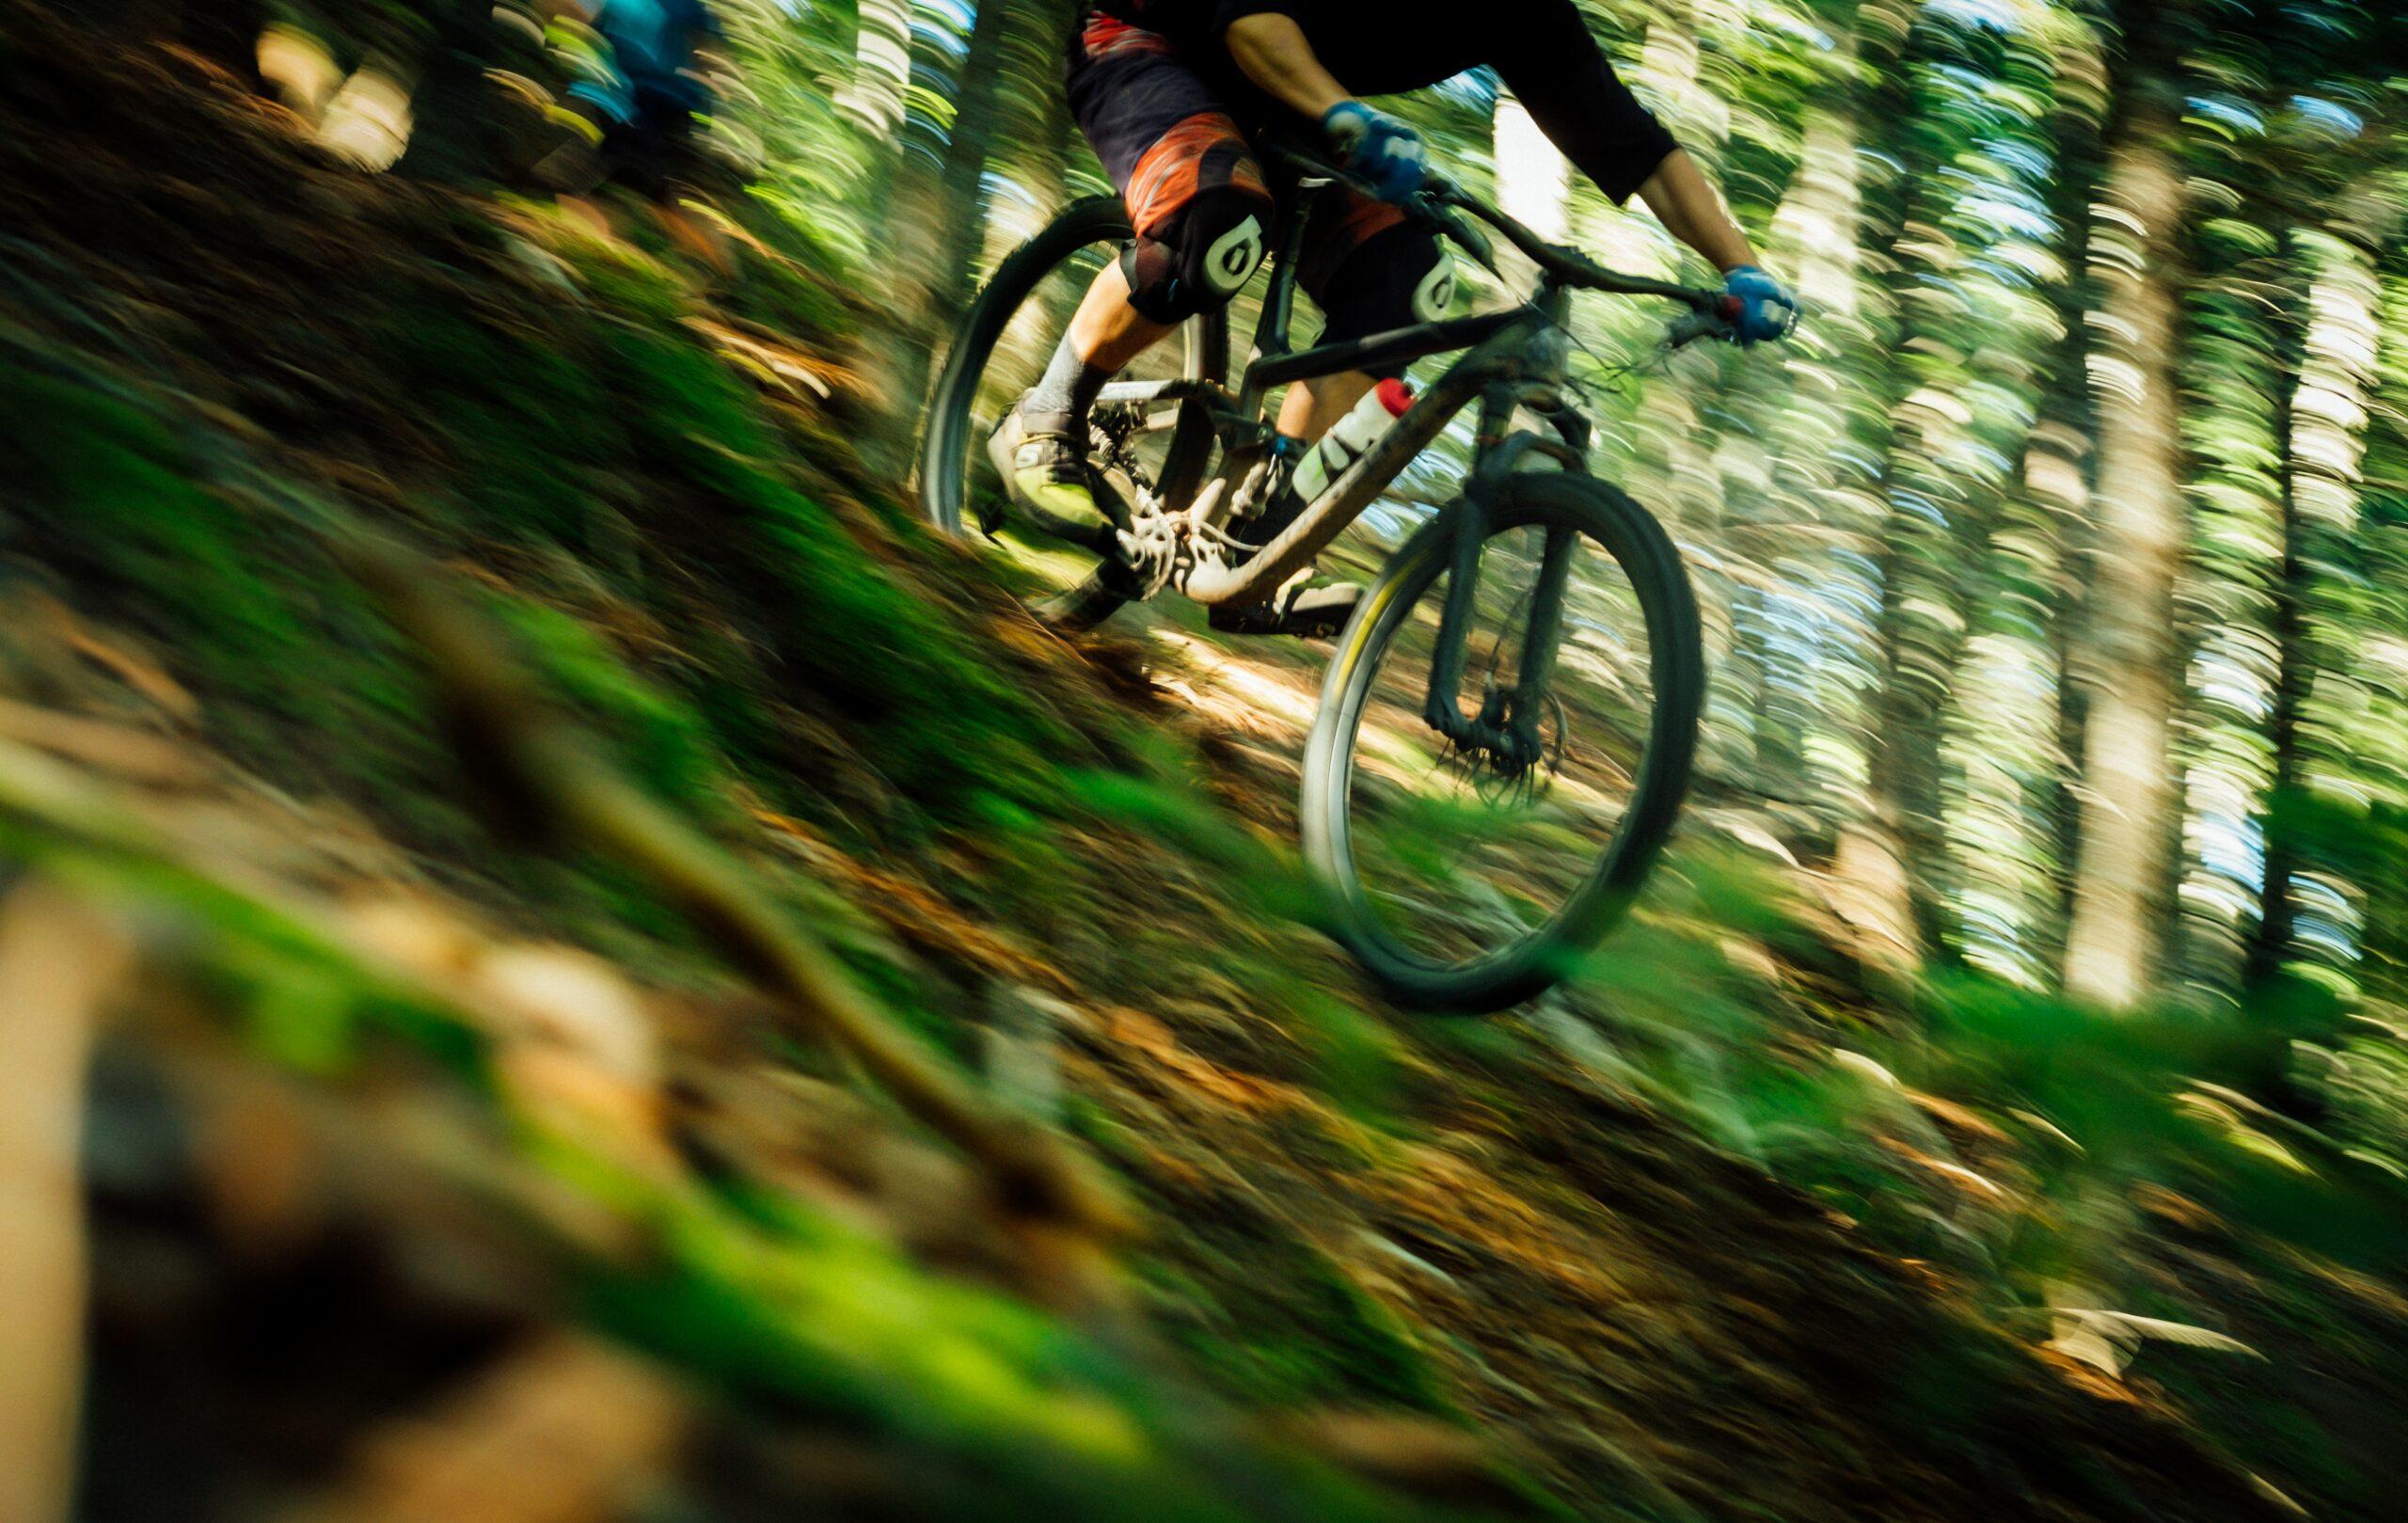 MTB Benasque - Viajes en bicicleta organizados